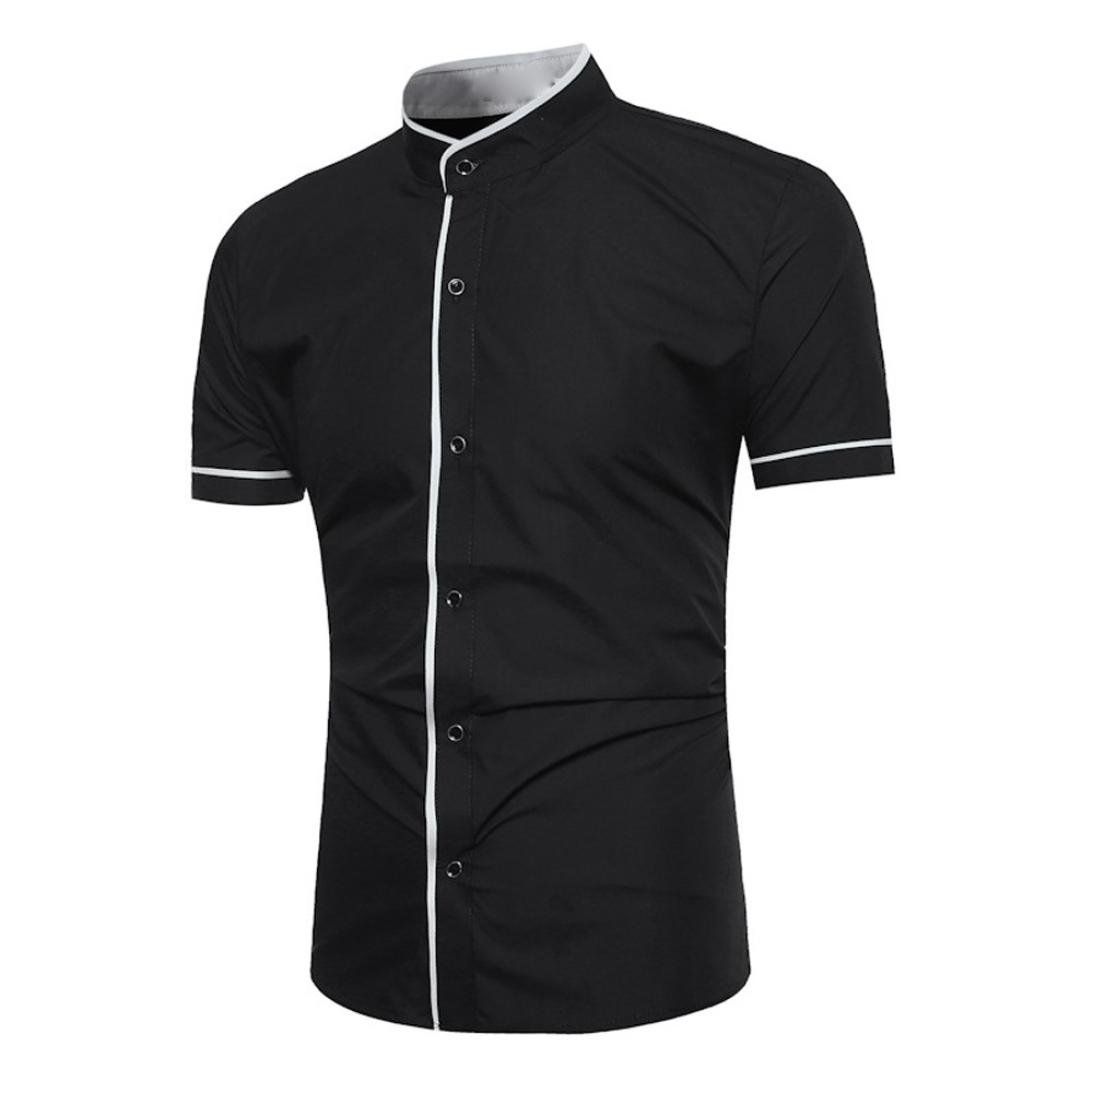 kaifongfu Men Shirt,Slim Fit Short Collar Sleeve Muscle Tee for Men T-Shirt Casual Tops Blouse(Black,L)